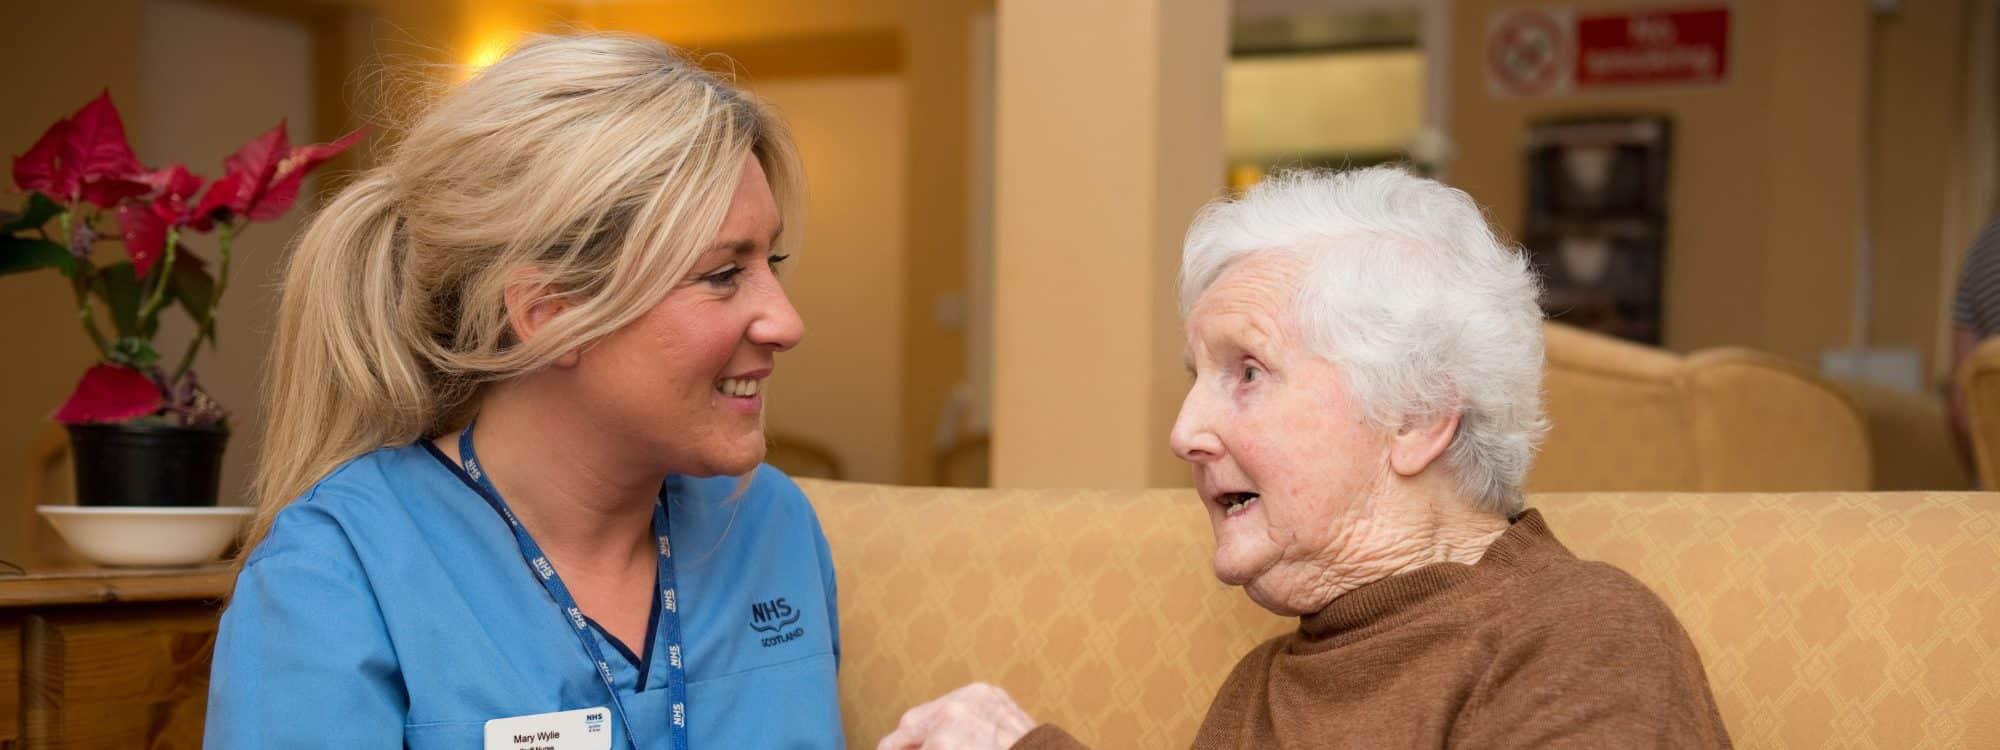 What is Community Nursing?